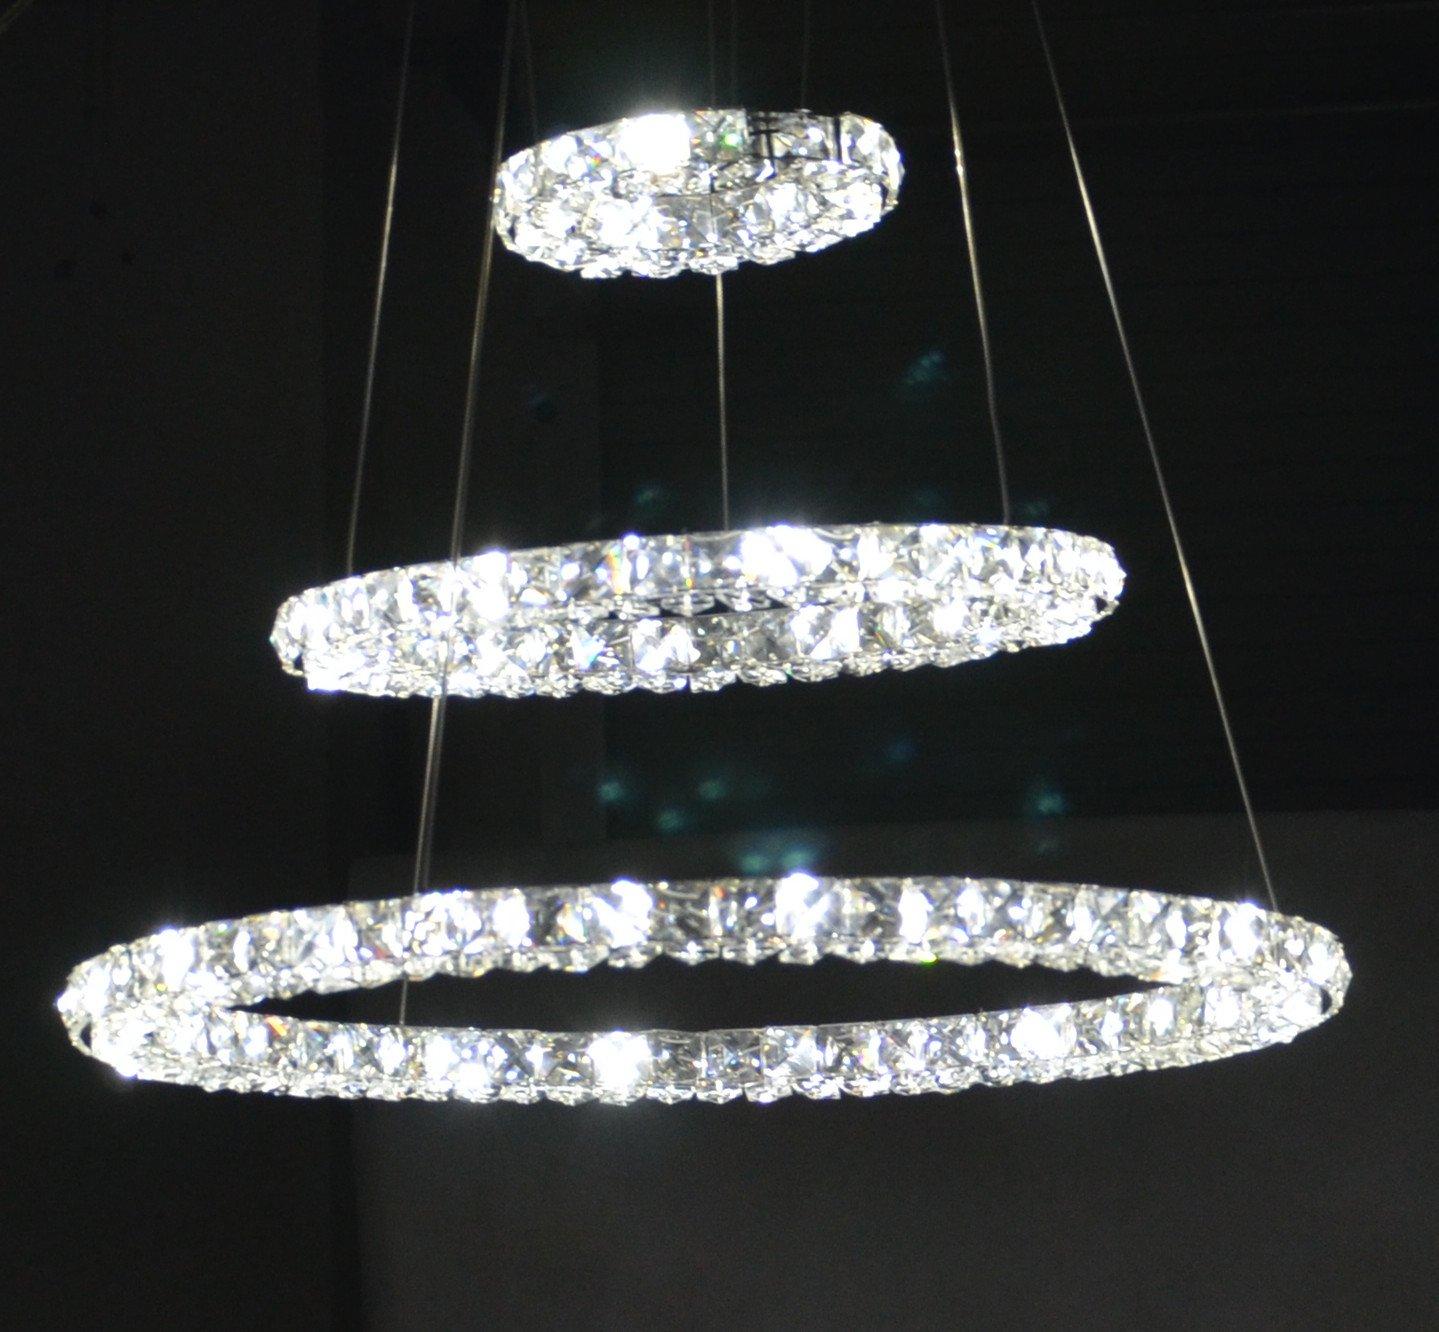 Modern Simple Stylish K Crystal Chandelier Ceiling Light Fixture Living Room Led Lighting Three Ring Random Variation D Cm V With